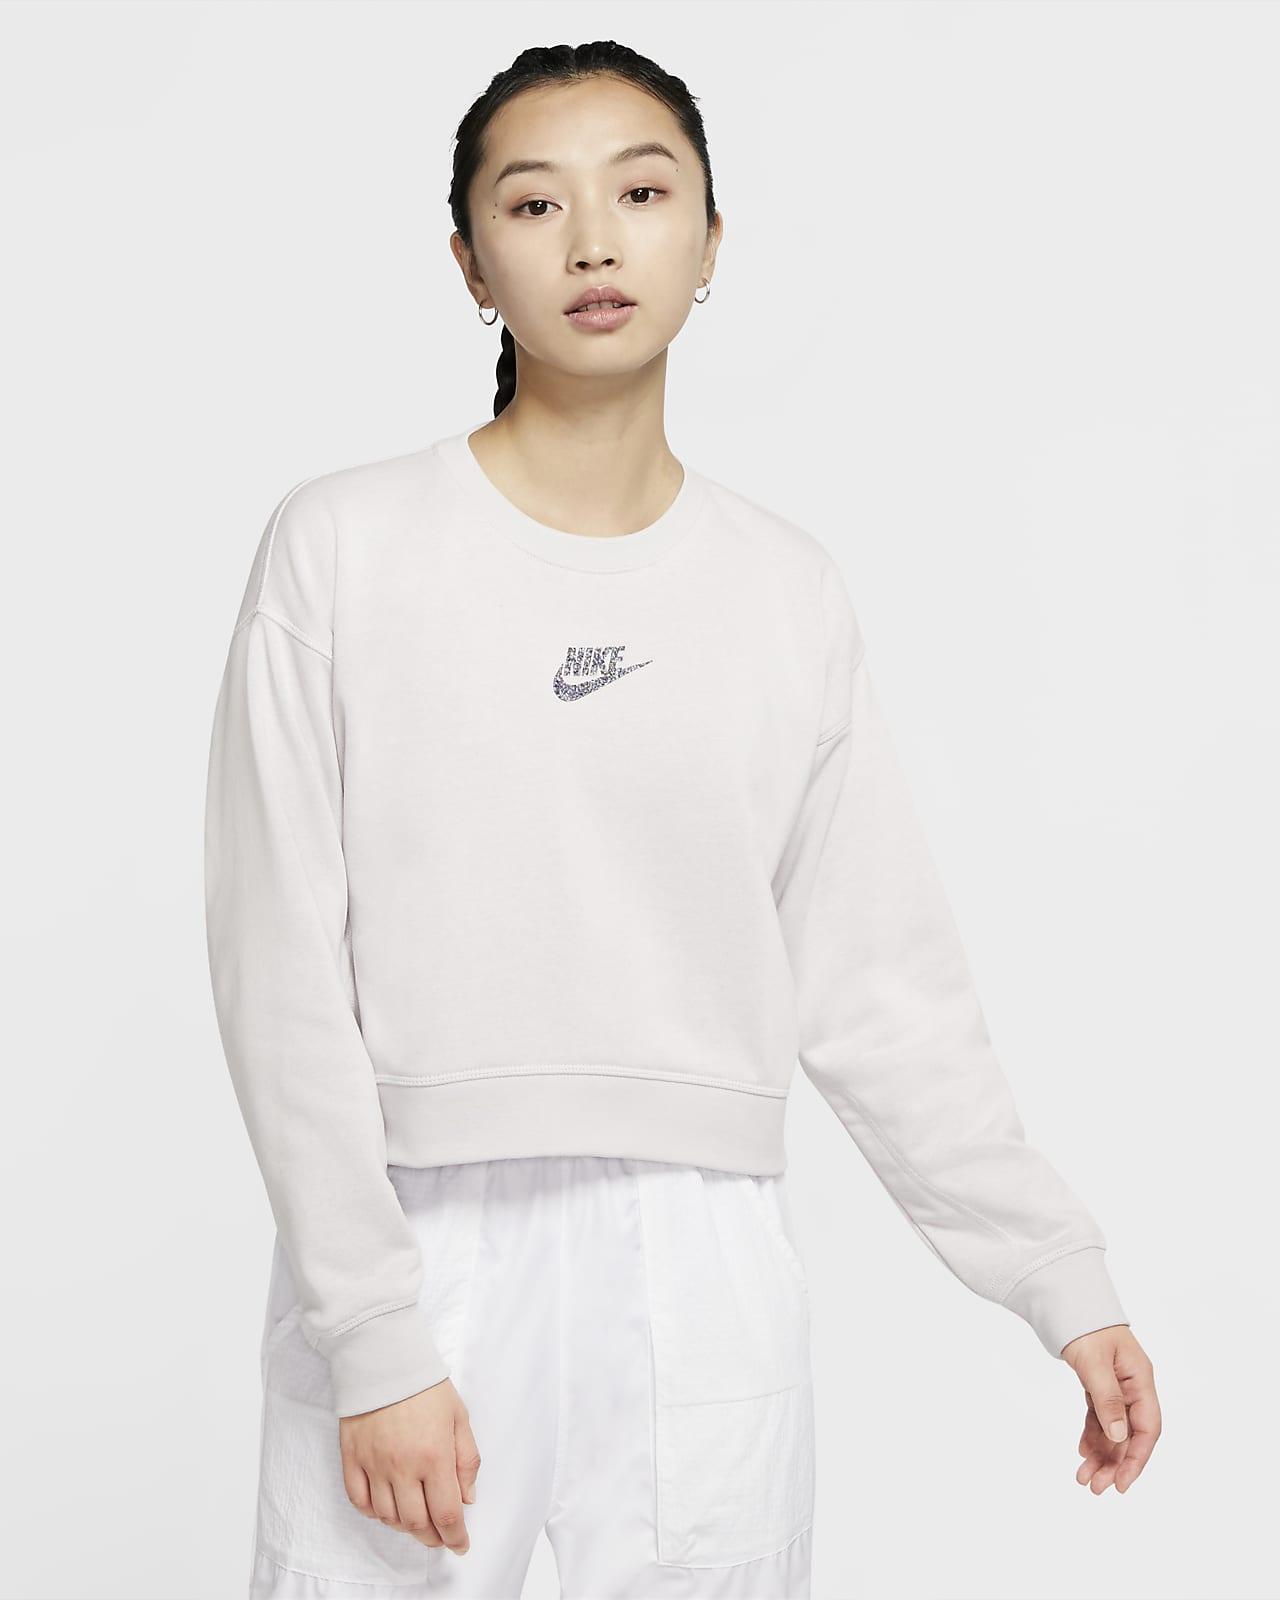 Camisola Nike Sportswear para mulher